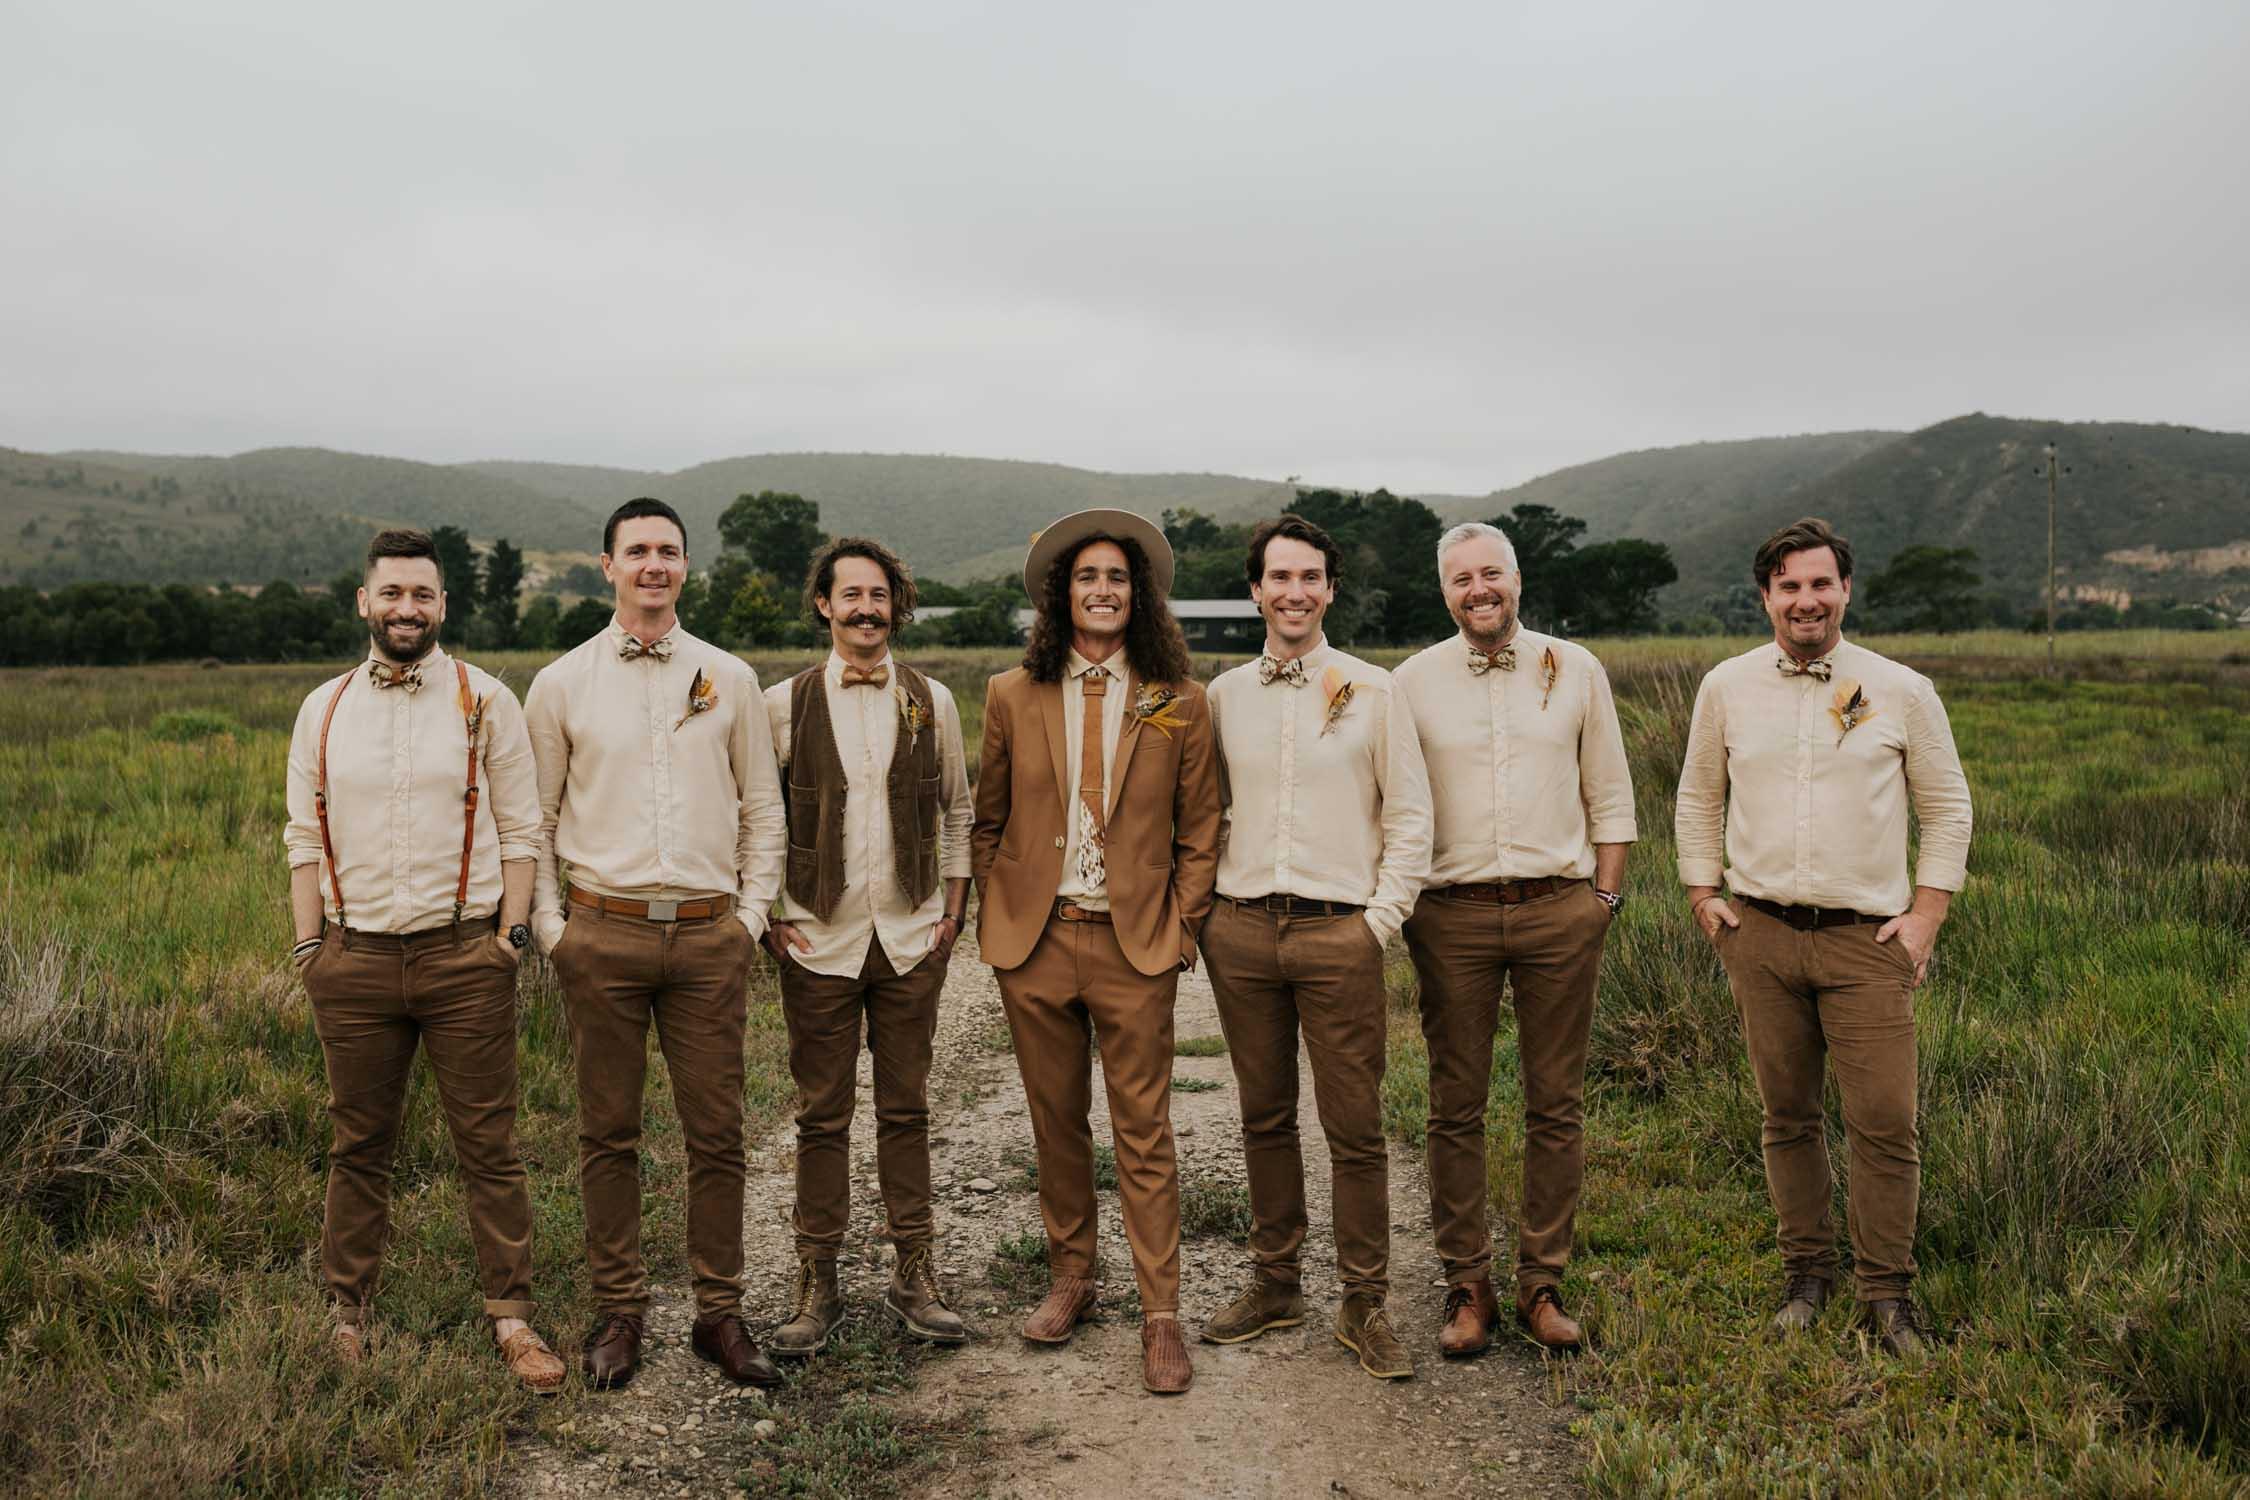 Groom and groomsmen wear brown suites, beige shirts, brown Nguni cowhide bowties, felt hat and foraged dried flowers and feather boutineers